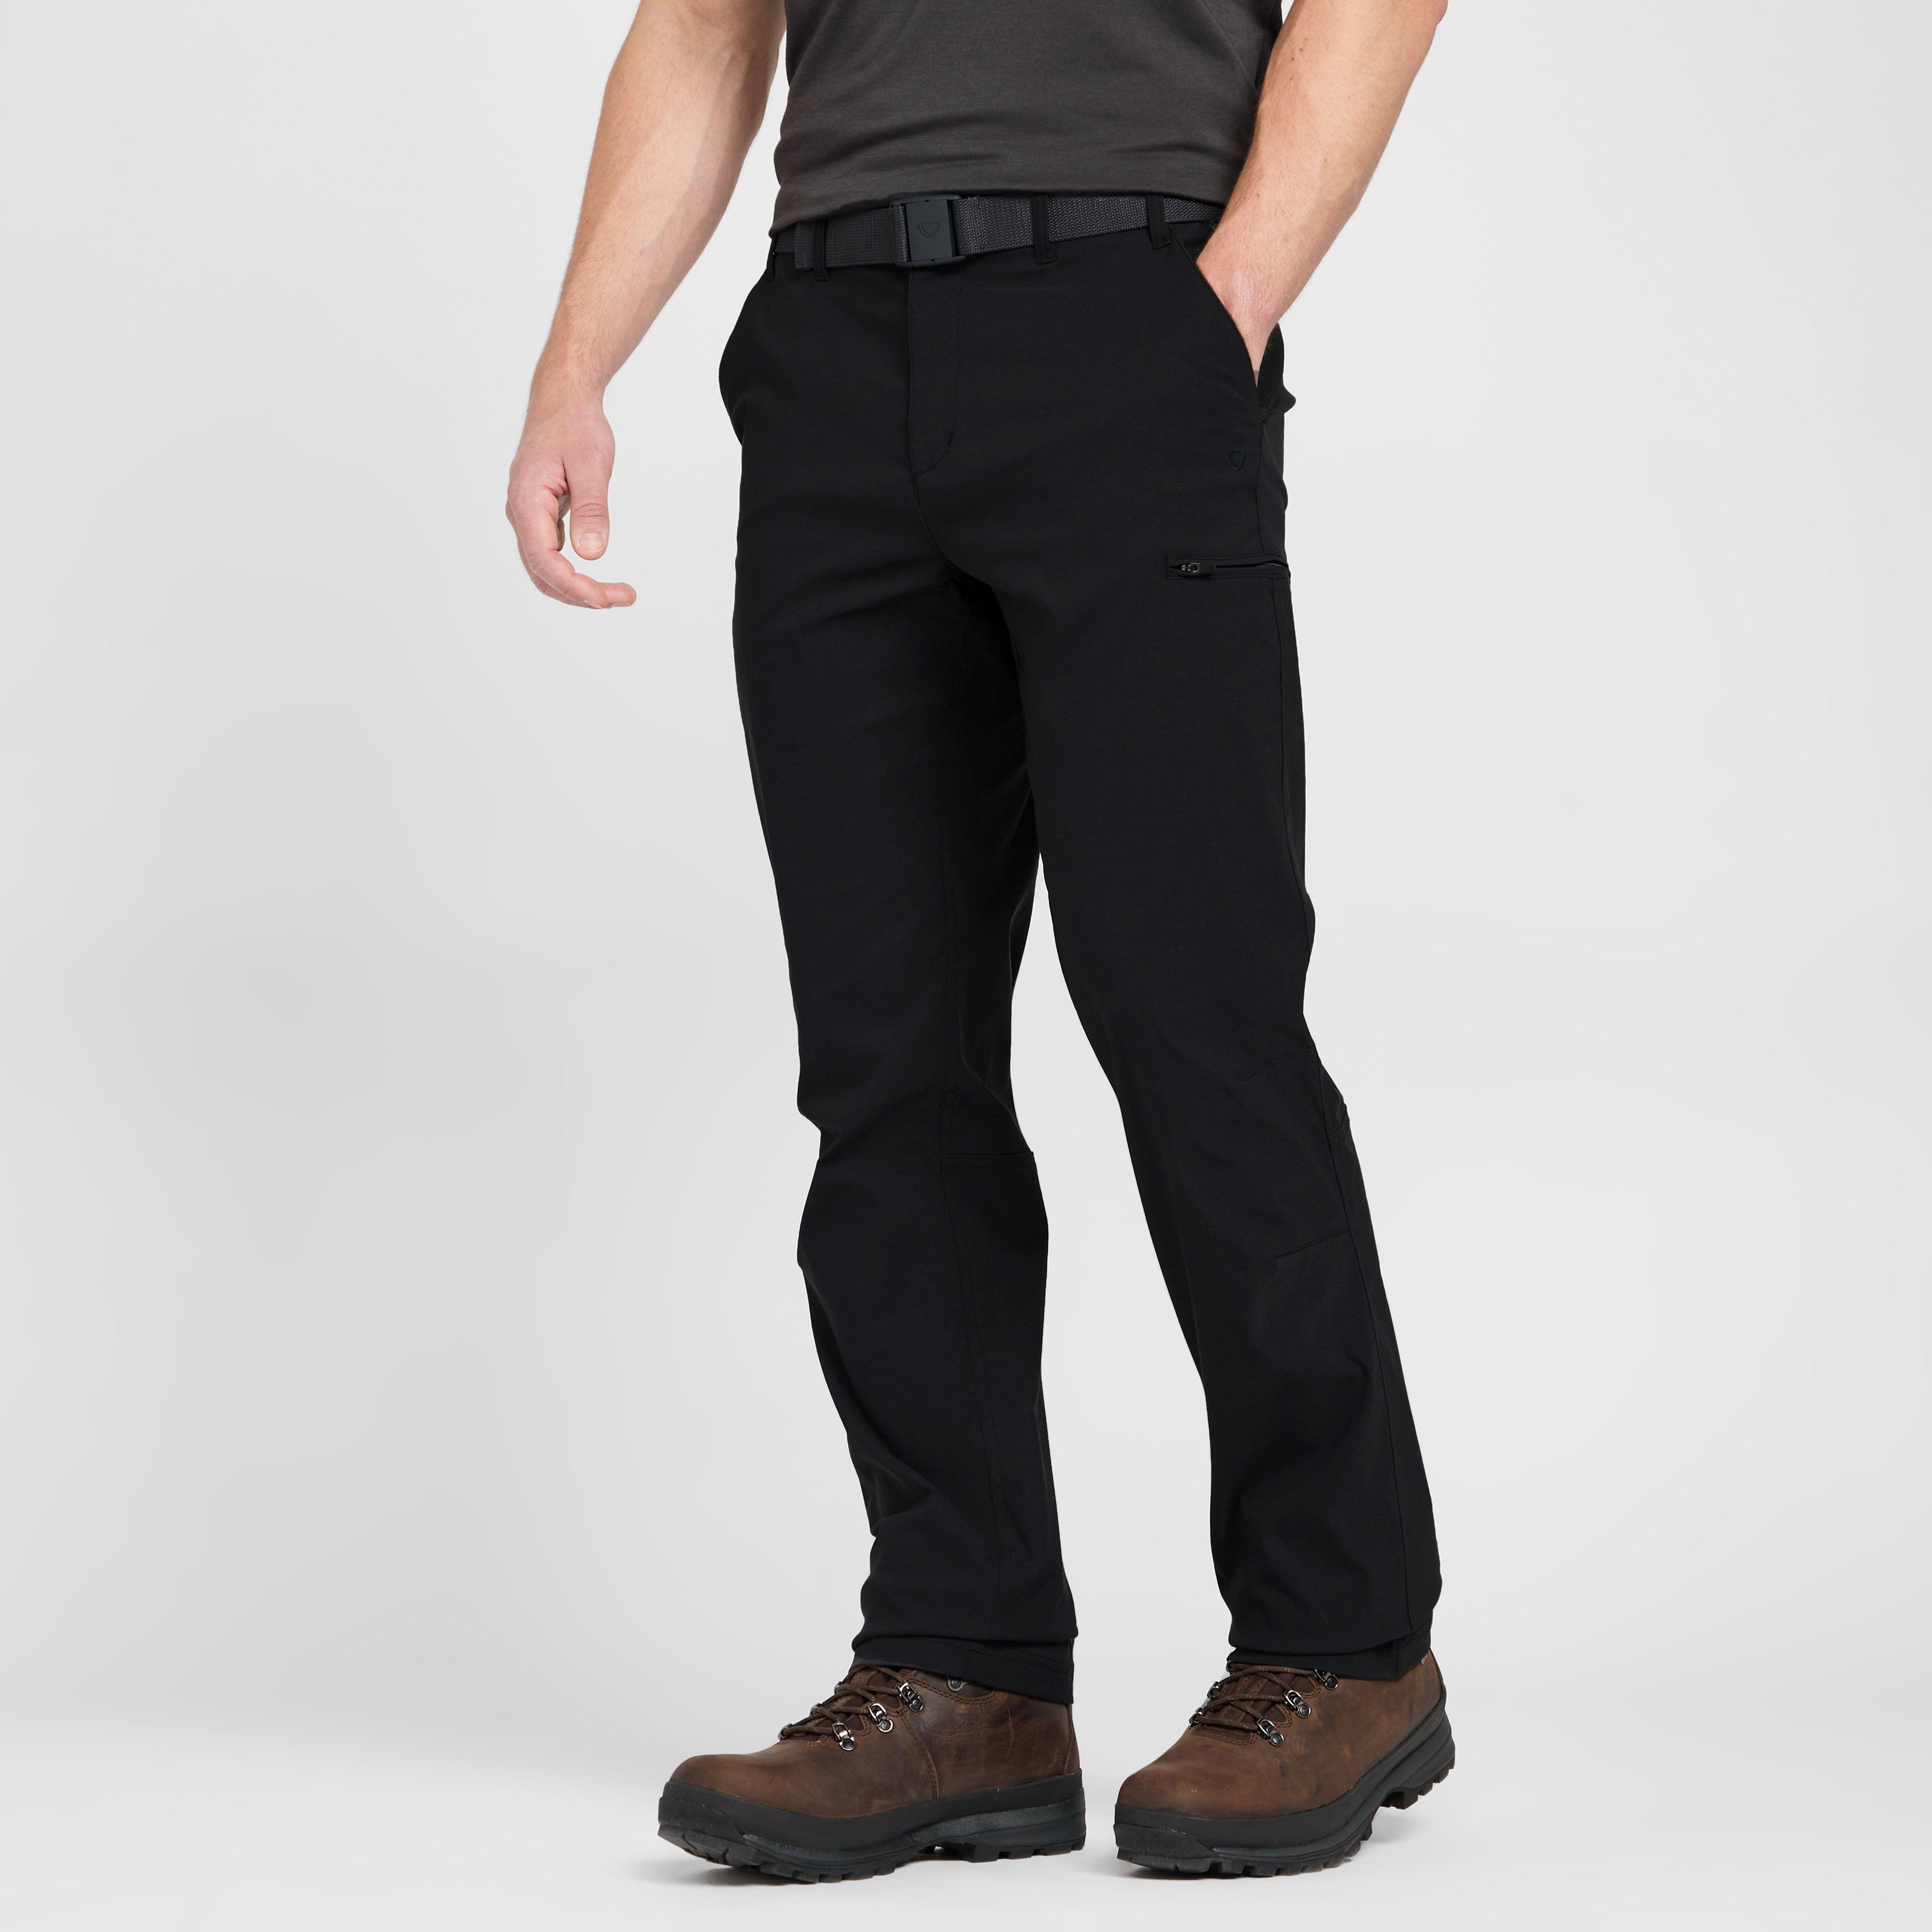 Brasher Mens Stretch Trousers - Black/black  Black/black